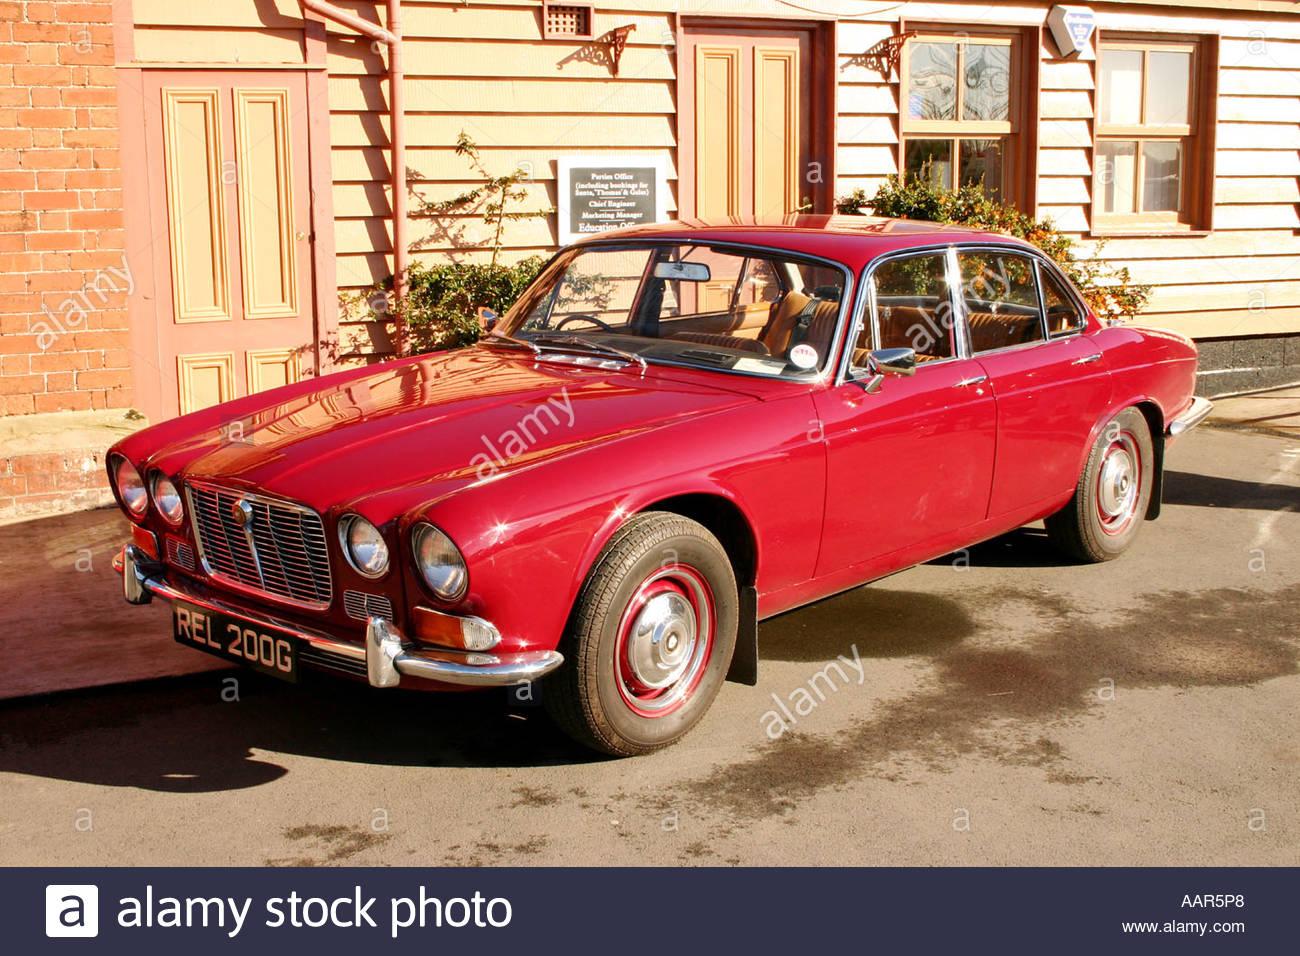 1969 jaguar xj6 saloon transport day severn valley railway stock1969 jaguar xj6 saloon transport day severn valley railway worcestershire